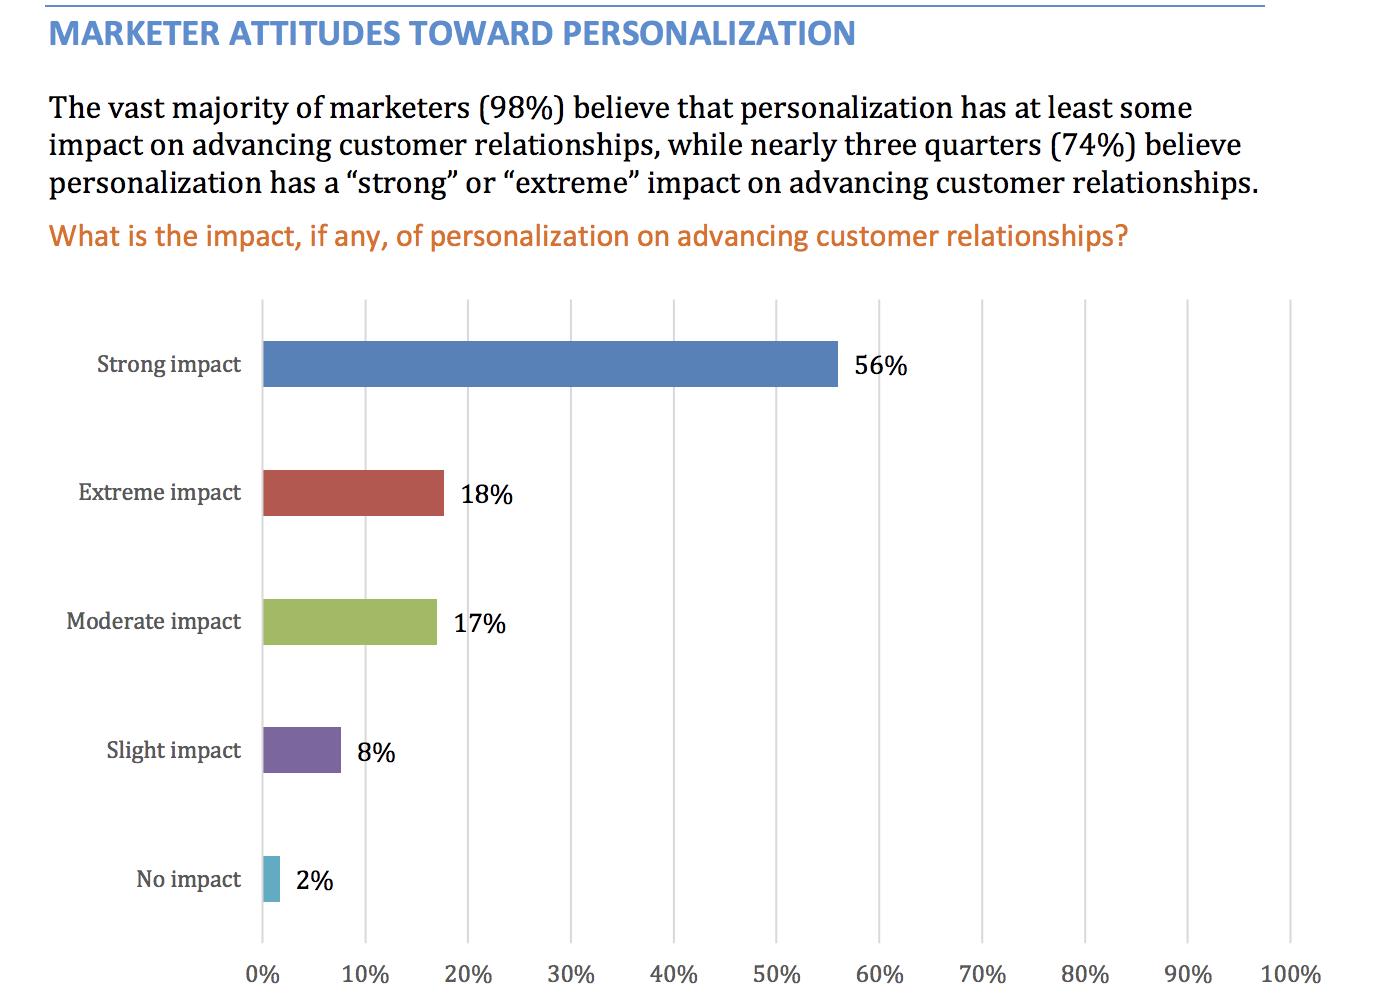 marketer attitudes toward personalization